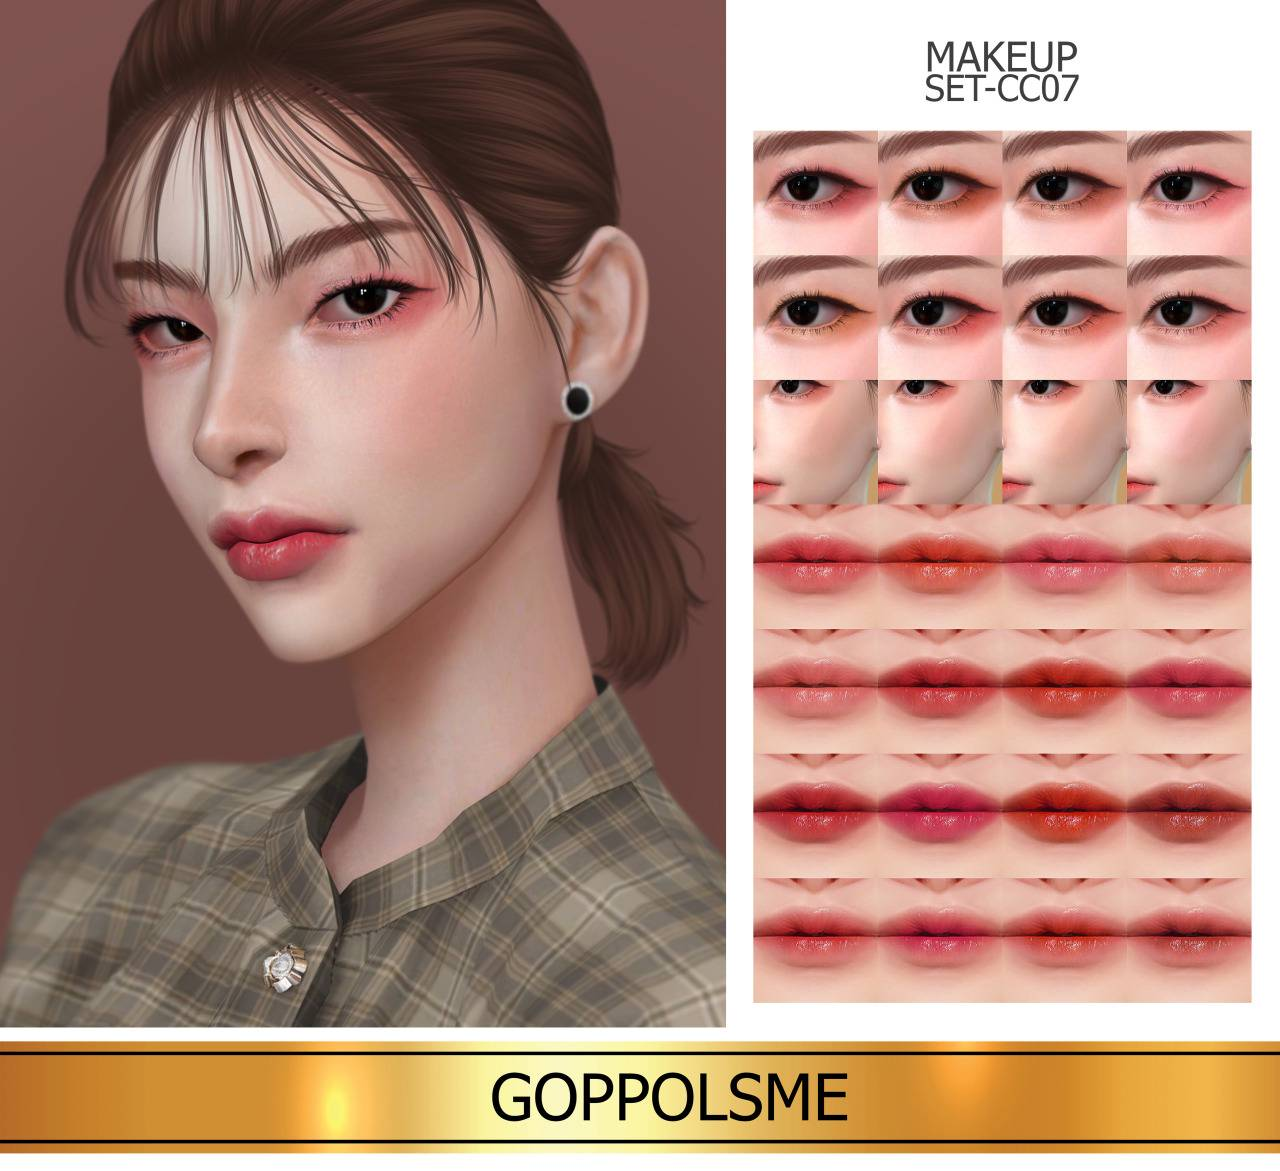 Набор косметики - MAKEUP SET CC07